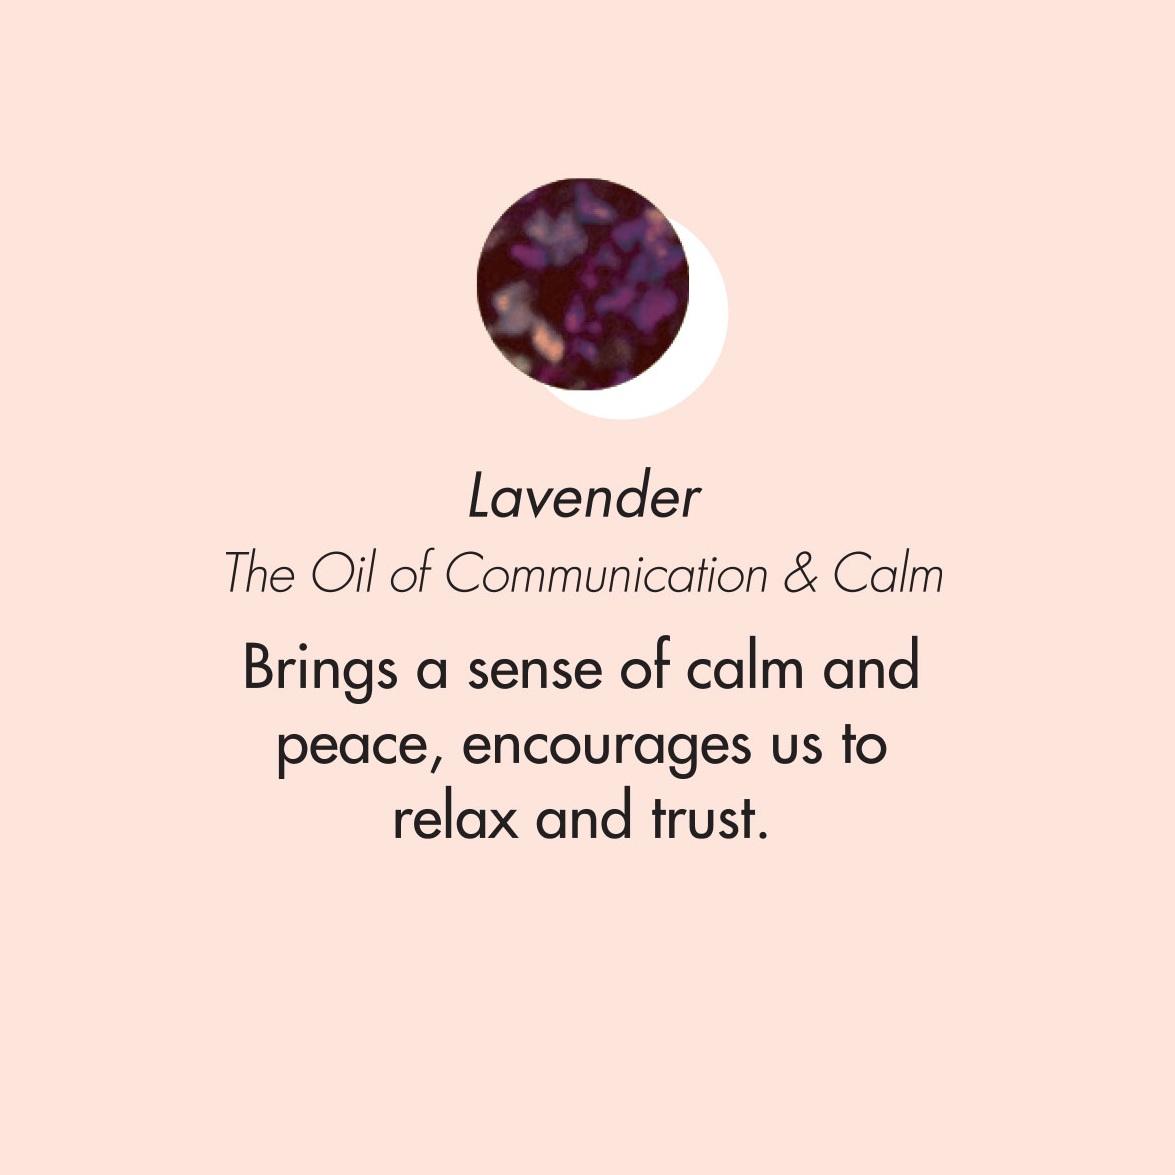 ptb_oils_lavender.jpg